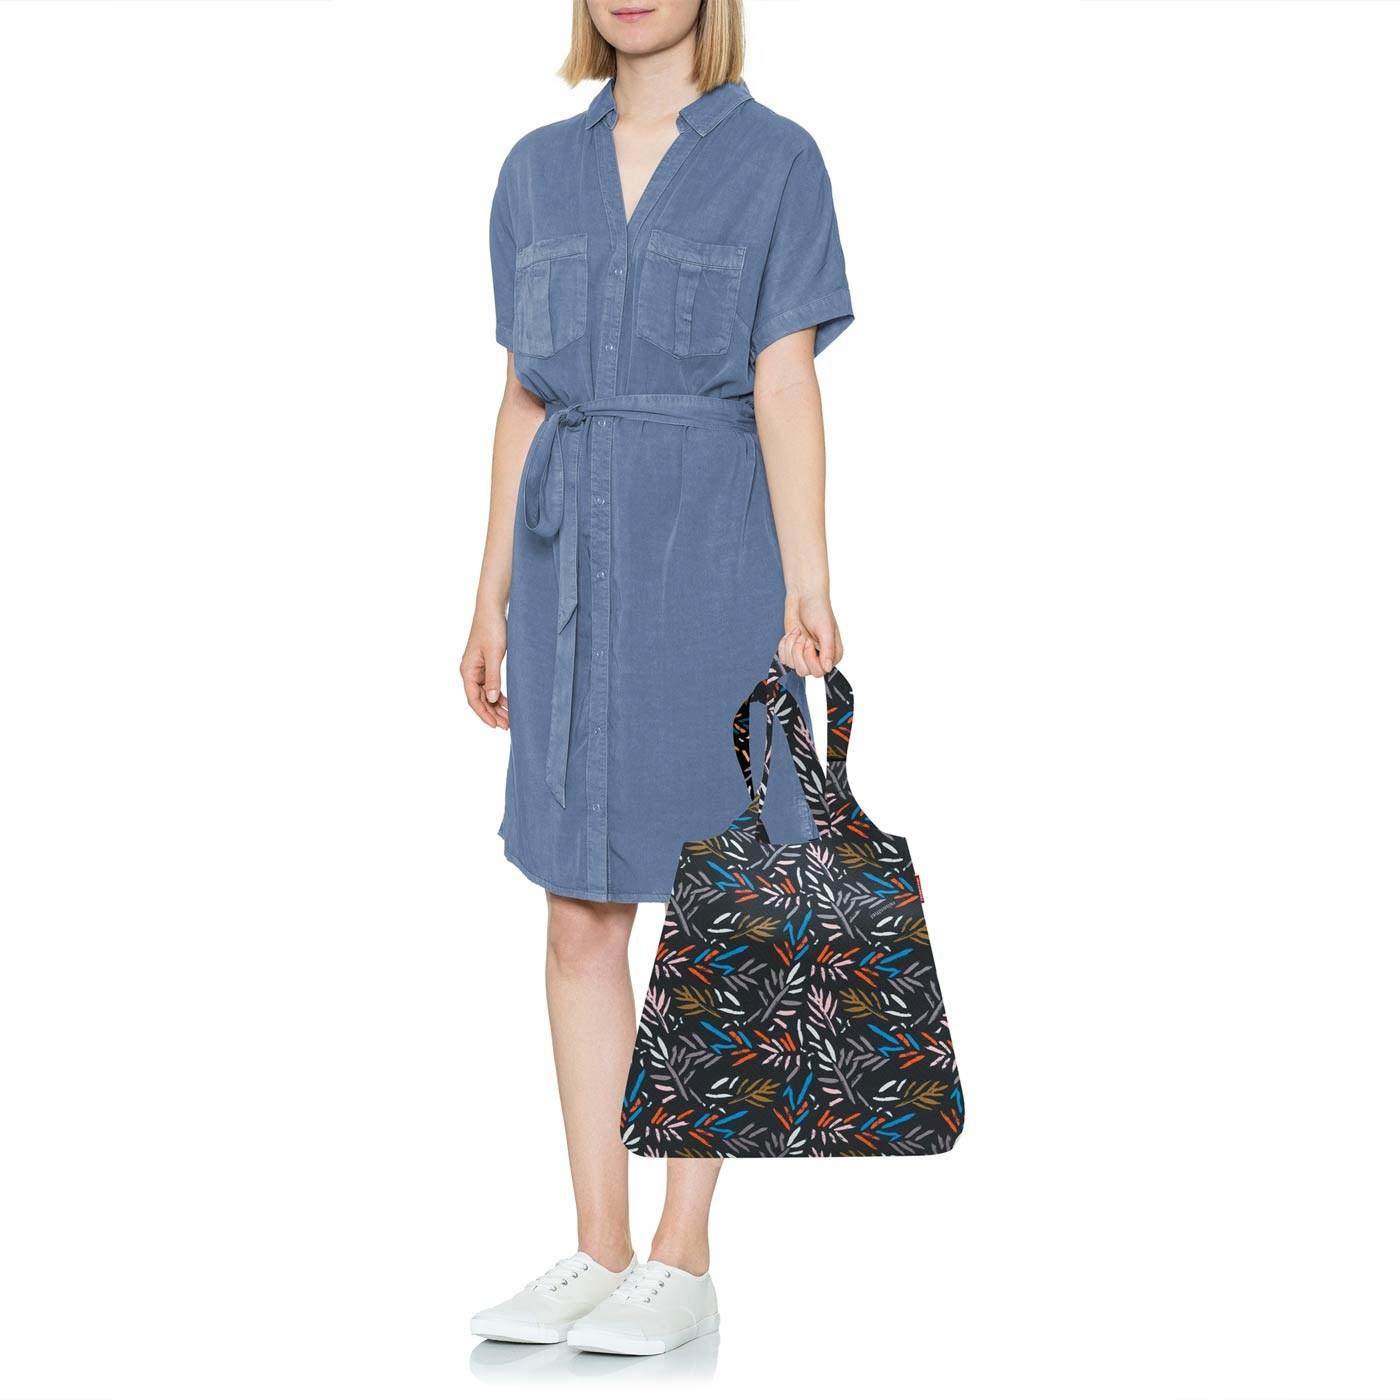 Skládací taška Mini Maxi Shopper autumn 1_2